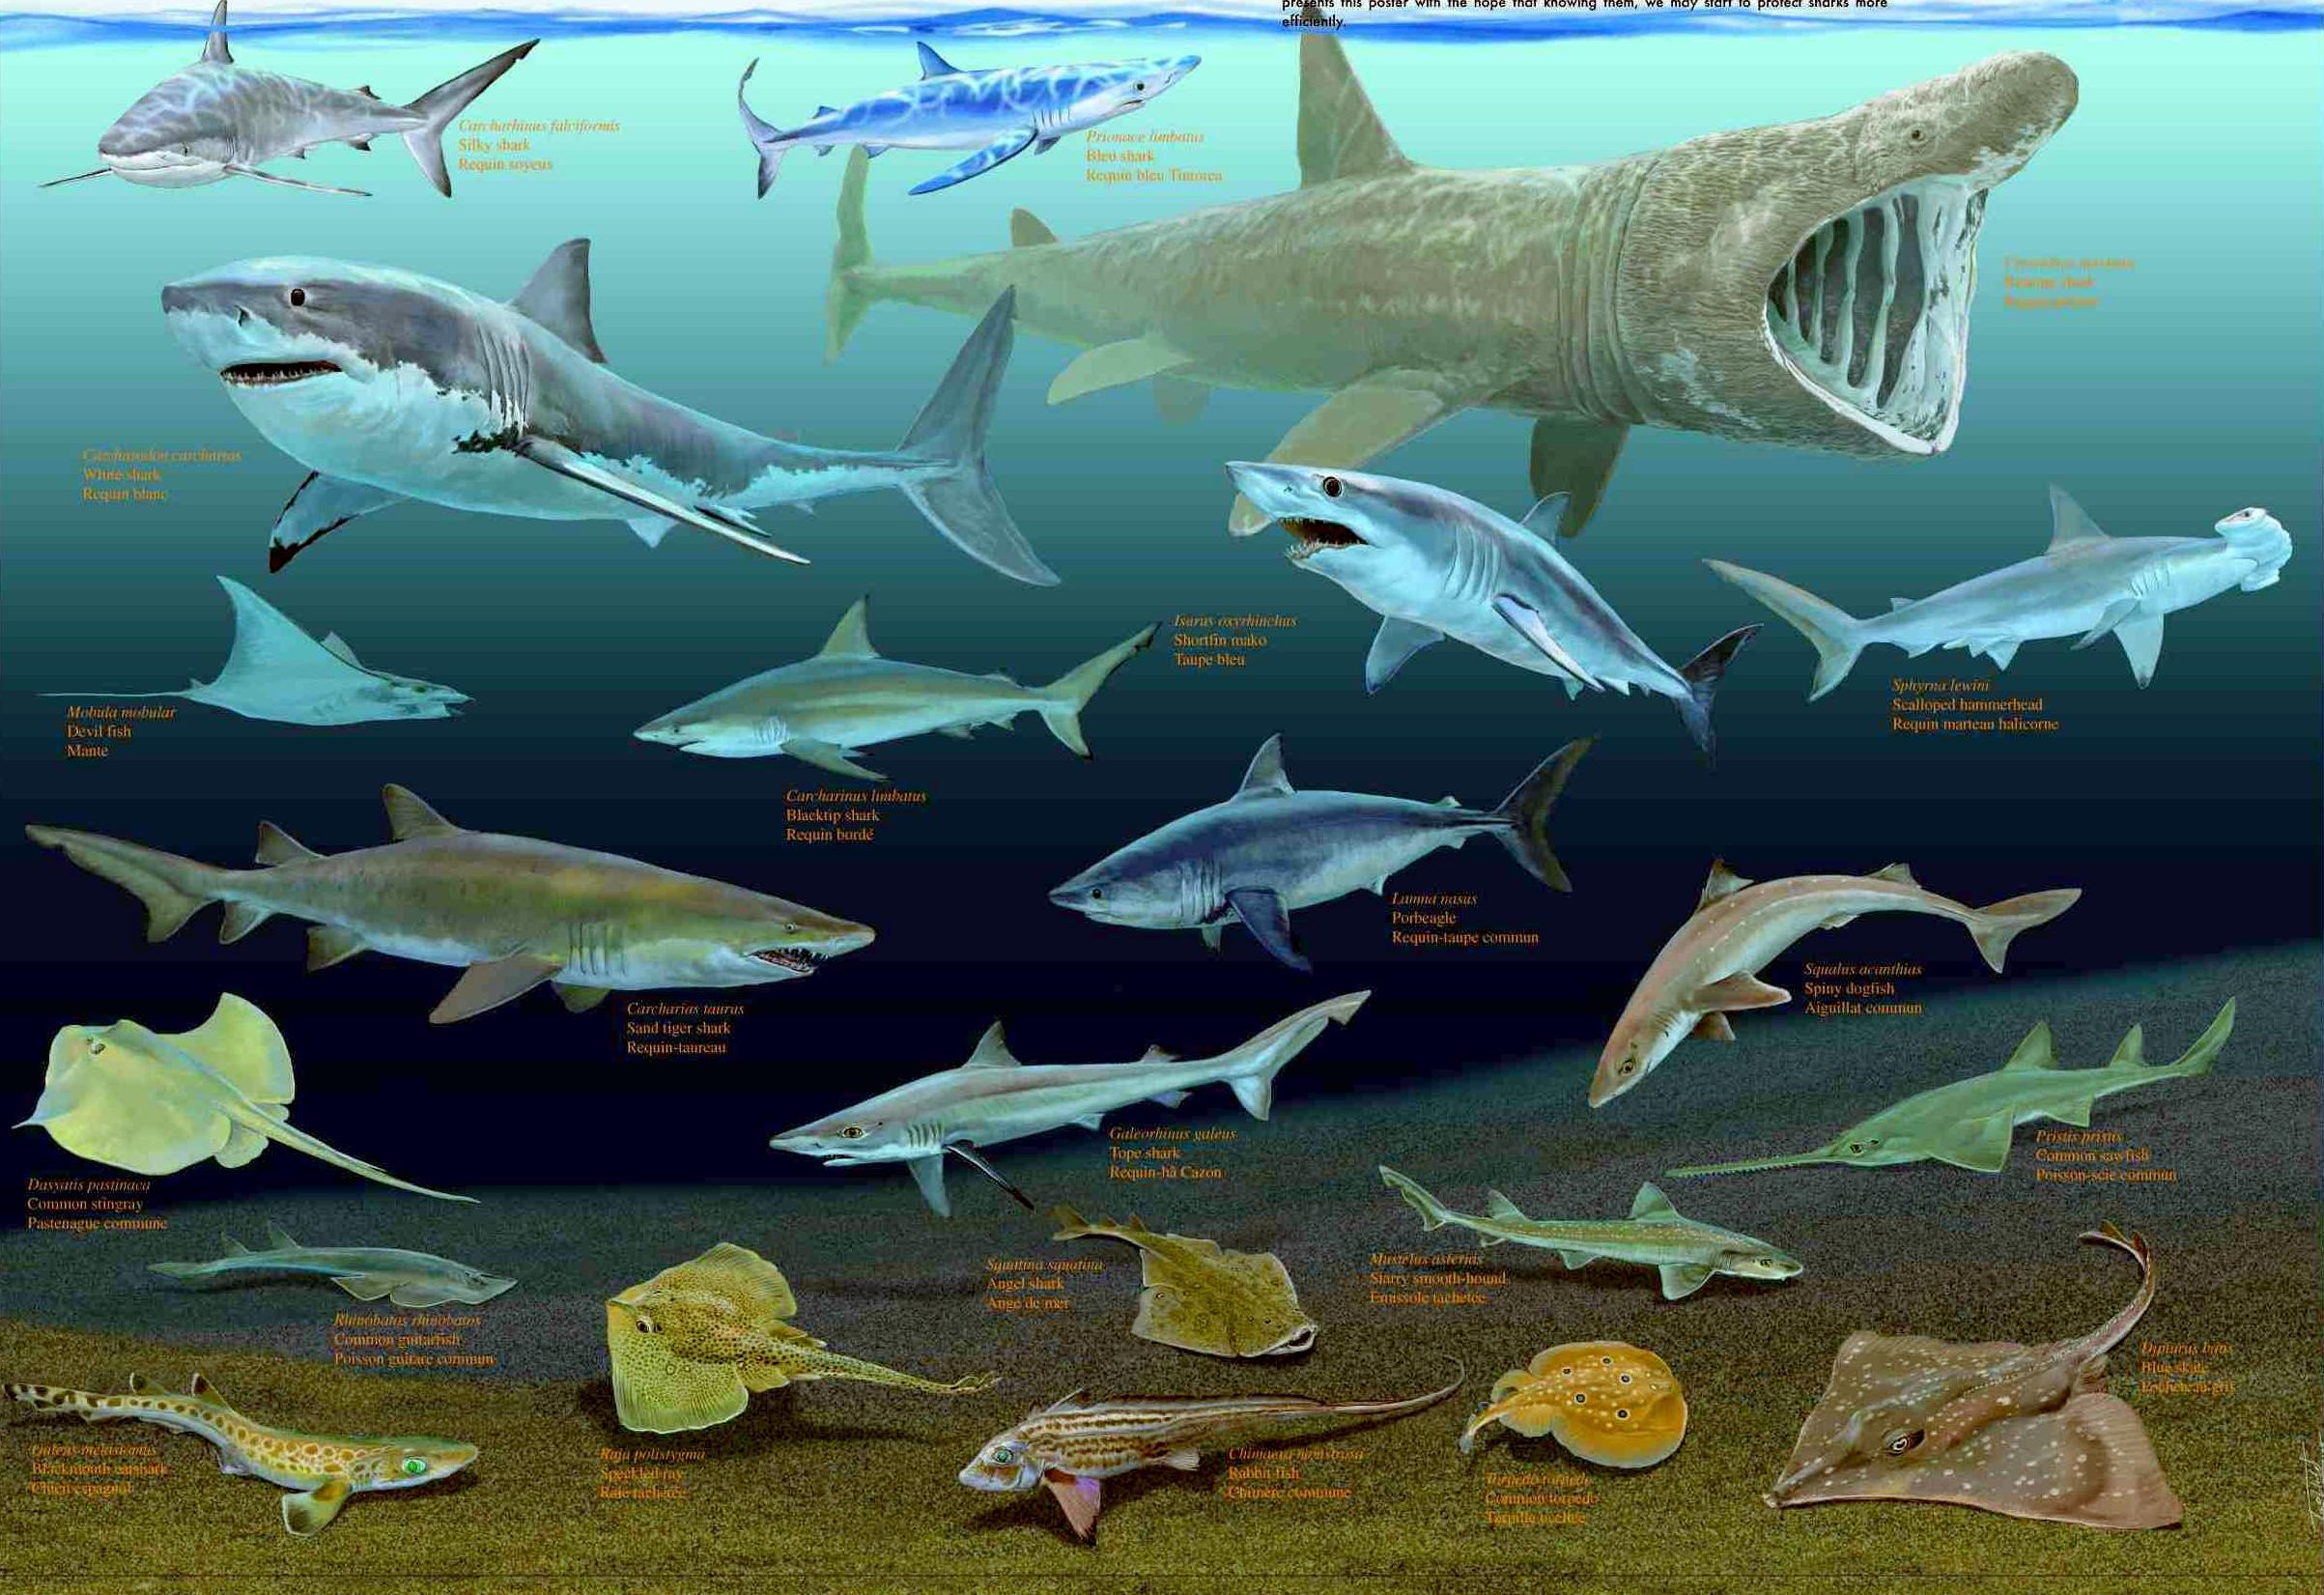 поделок макарон виды акул средиземного моря фото и название она